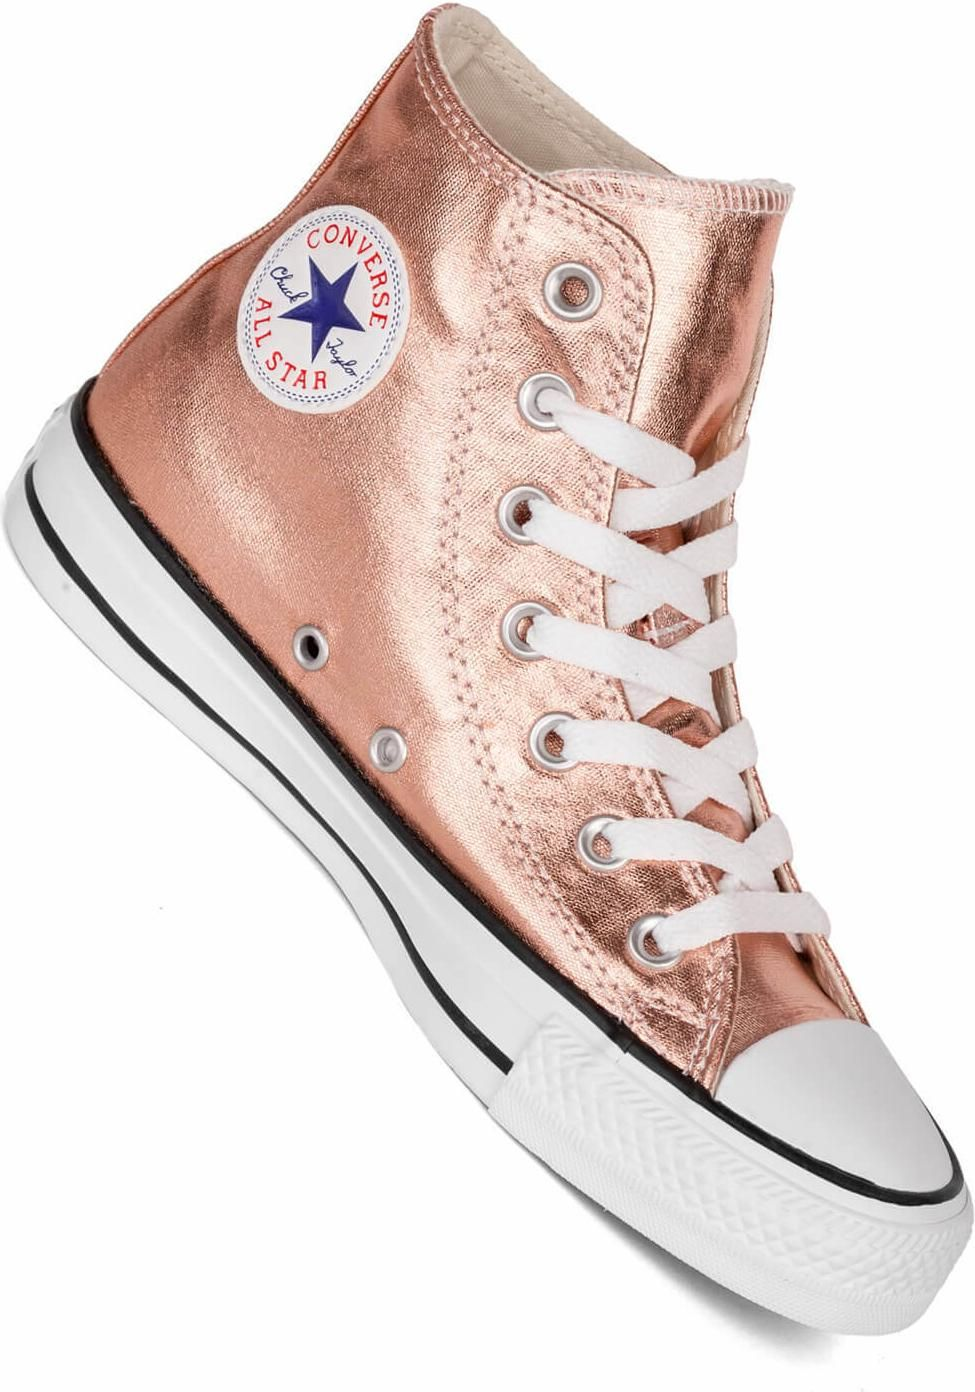 Converse Chucks Hi metallic sunset glow Damen Sneaker im Fashion Look